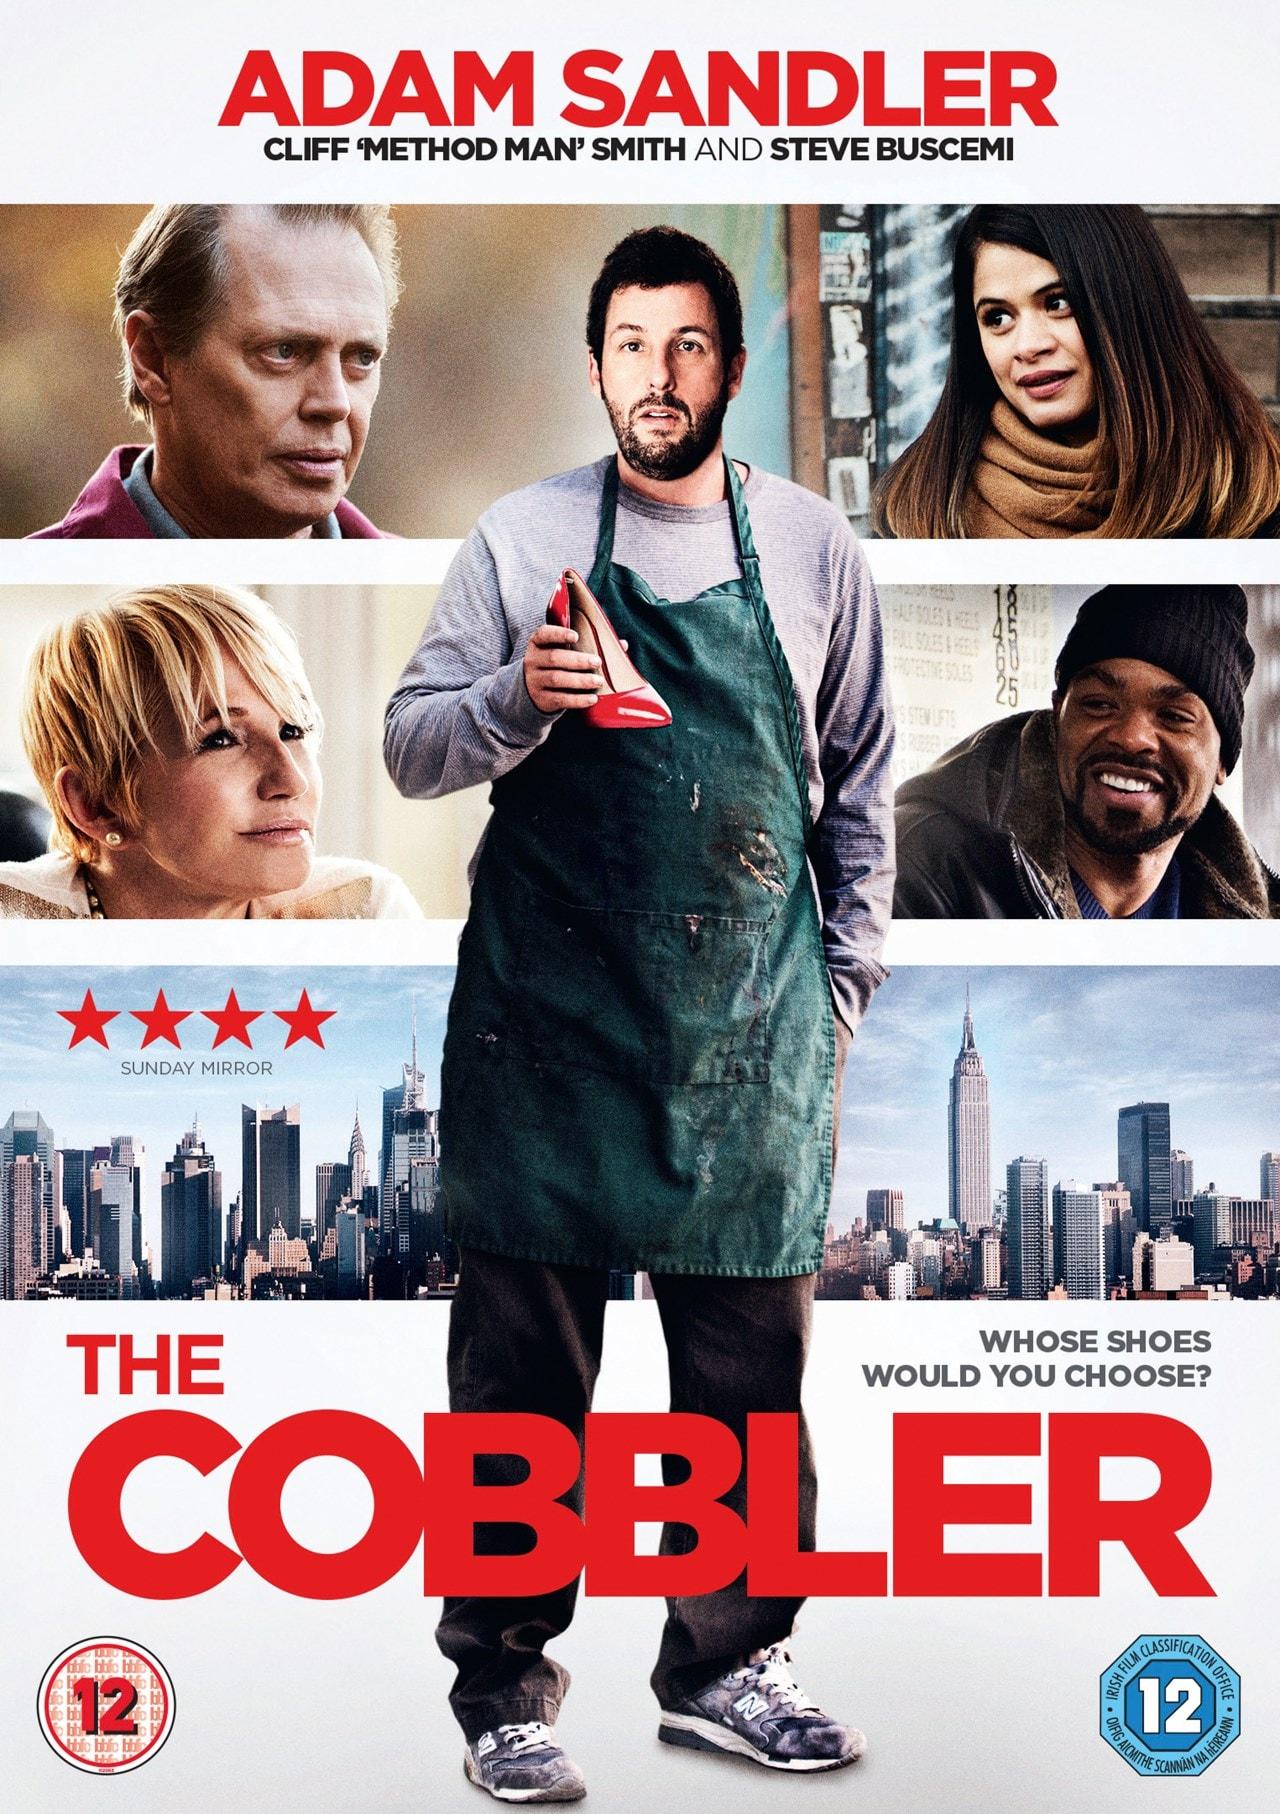 The Cobbler - 1